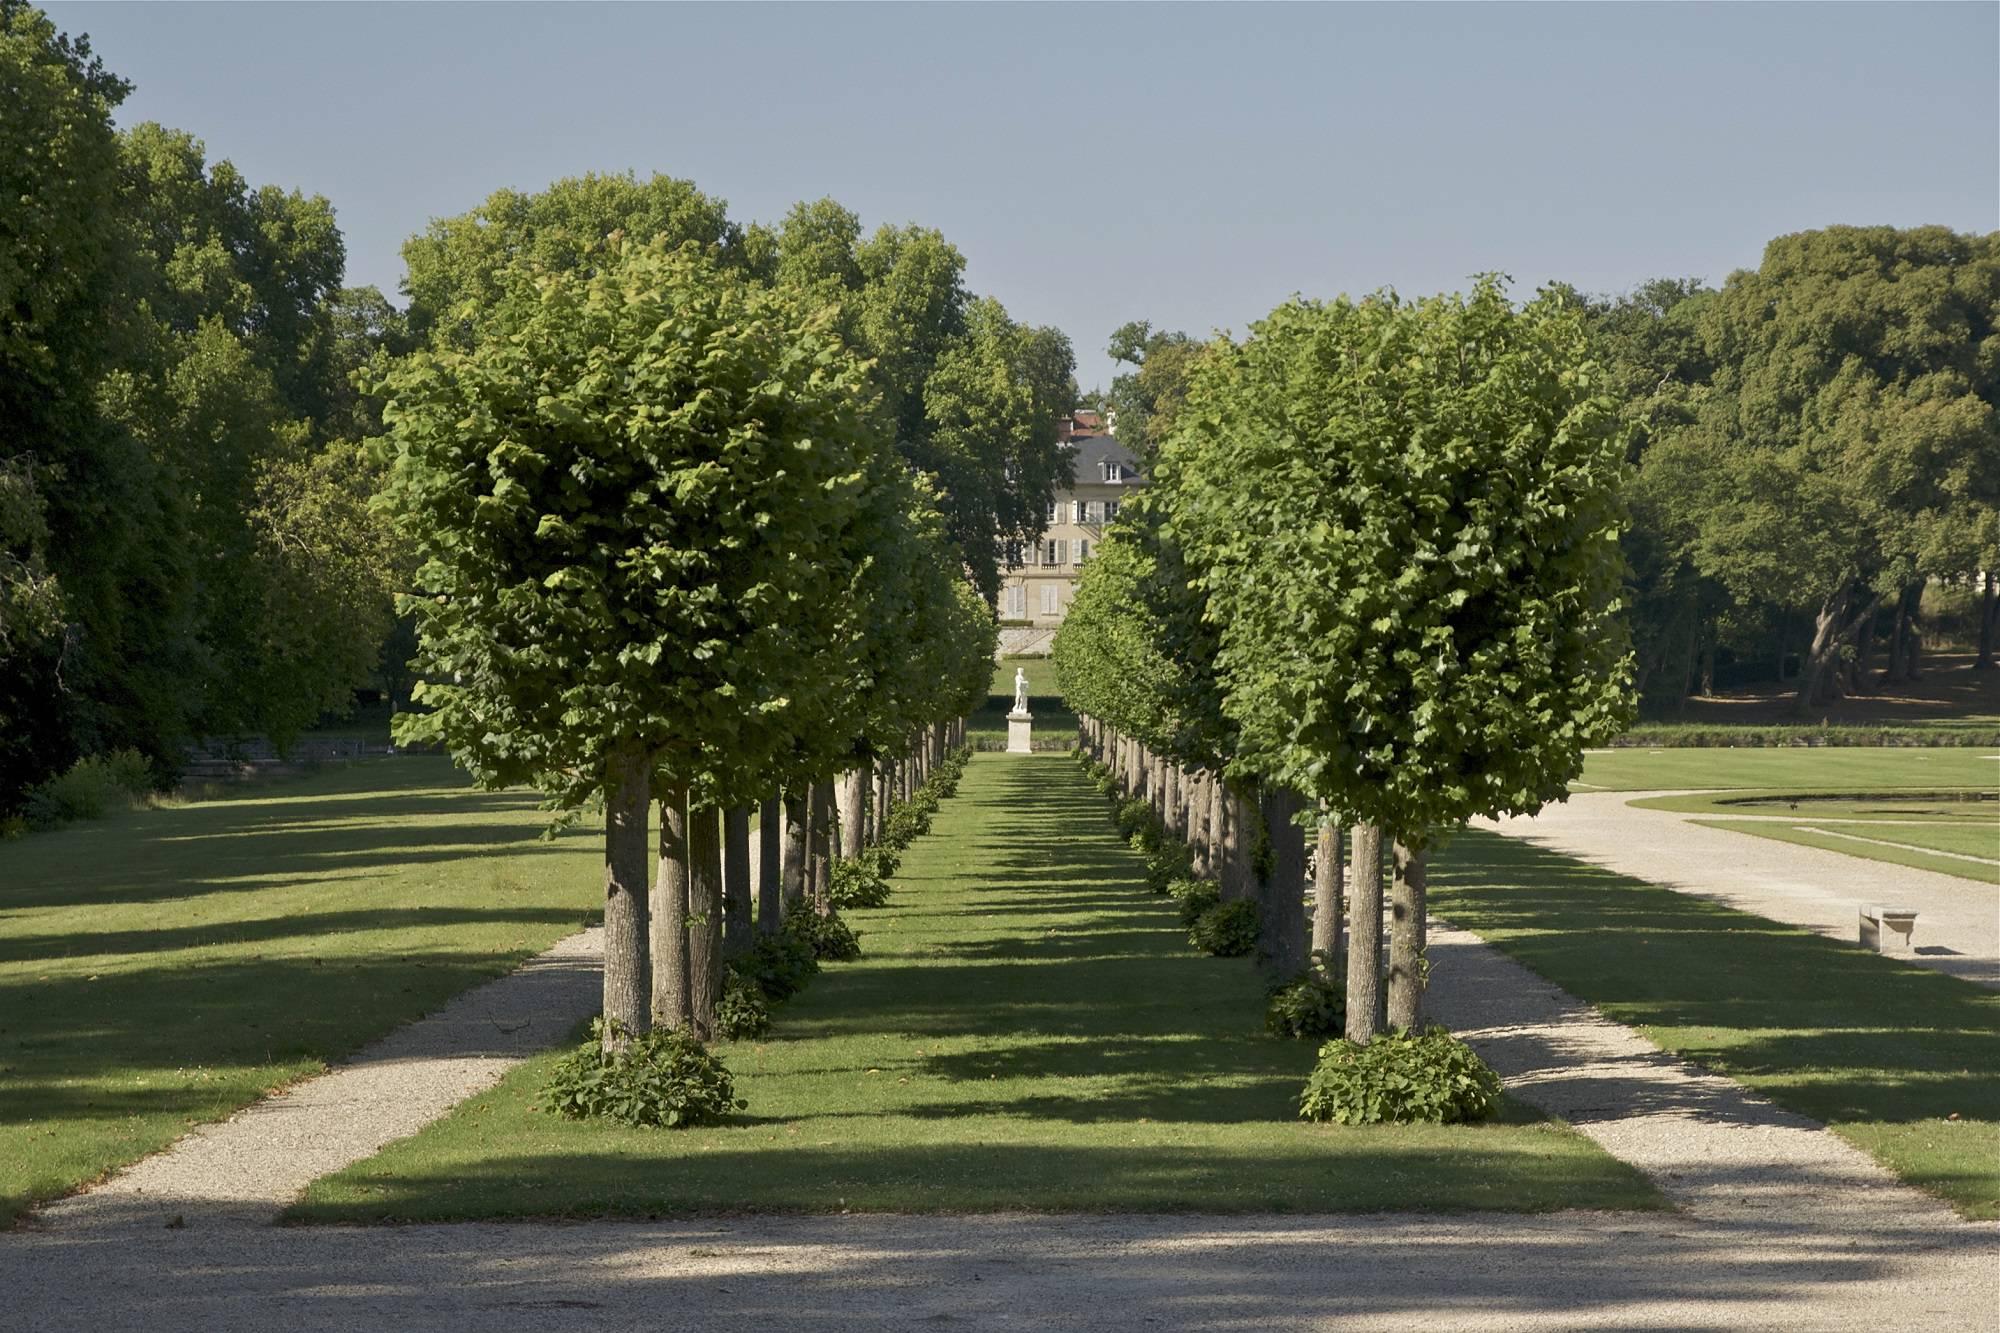 Allée du château de Chantilly